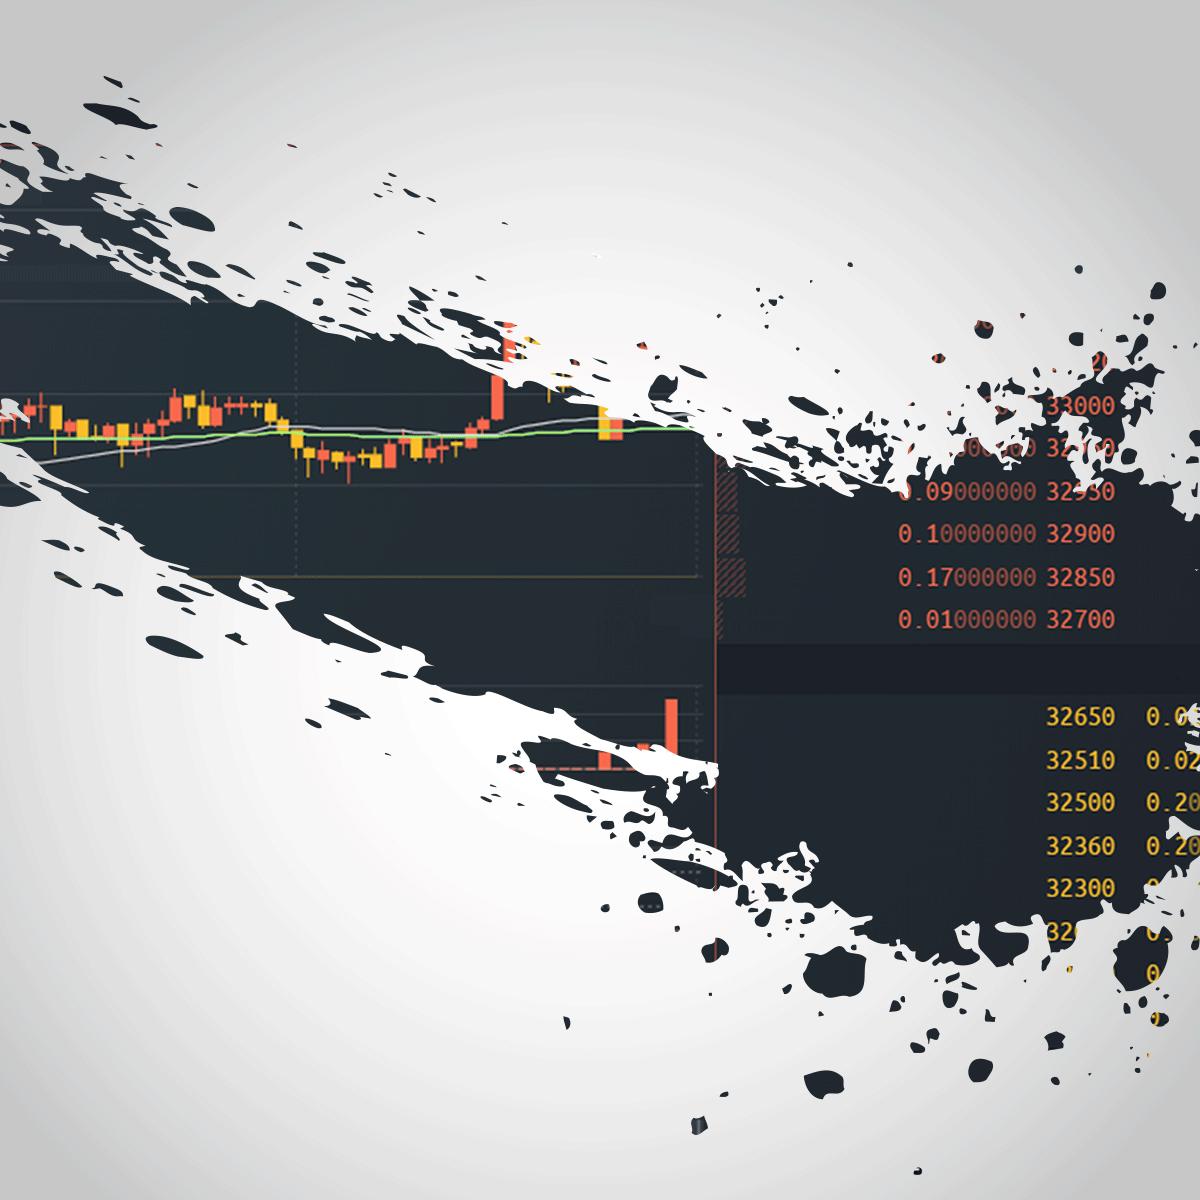 test ツイッターメディア - bitFlyerの最終取引価格 = ¥1,103,245 best_bid = ¥1,102,990 best_ask = ¥1,103,716 (2019年09月17日 16時58分58秒) #ビットフライヤー https://t.co/Lci4S18NN2